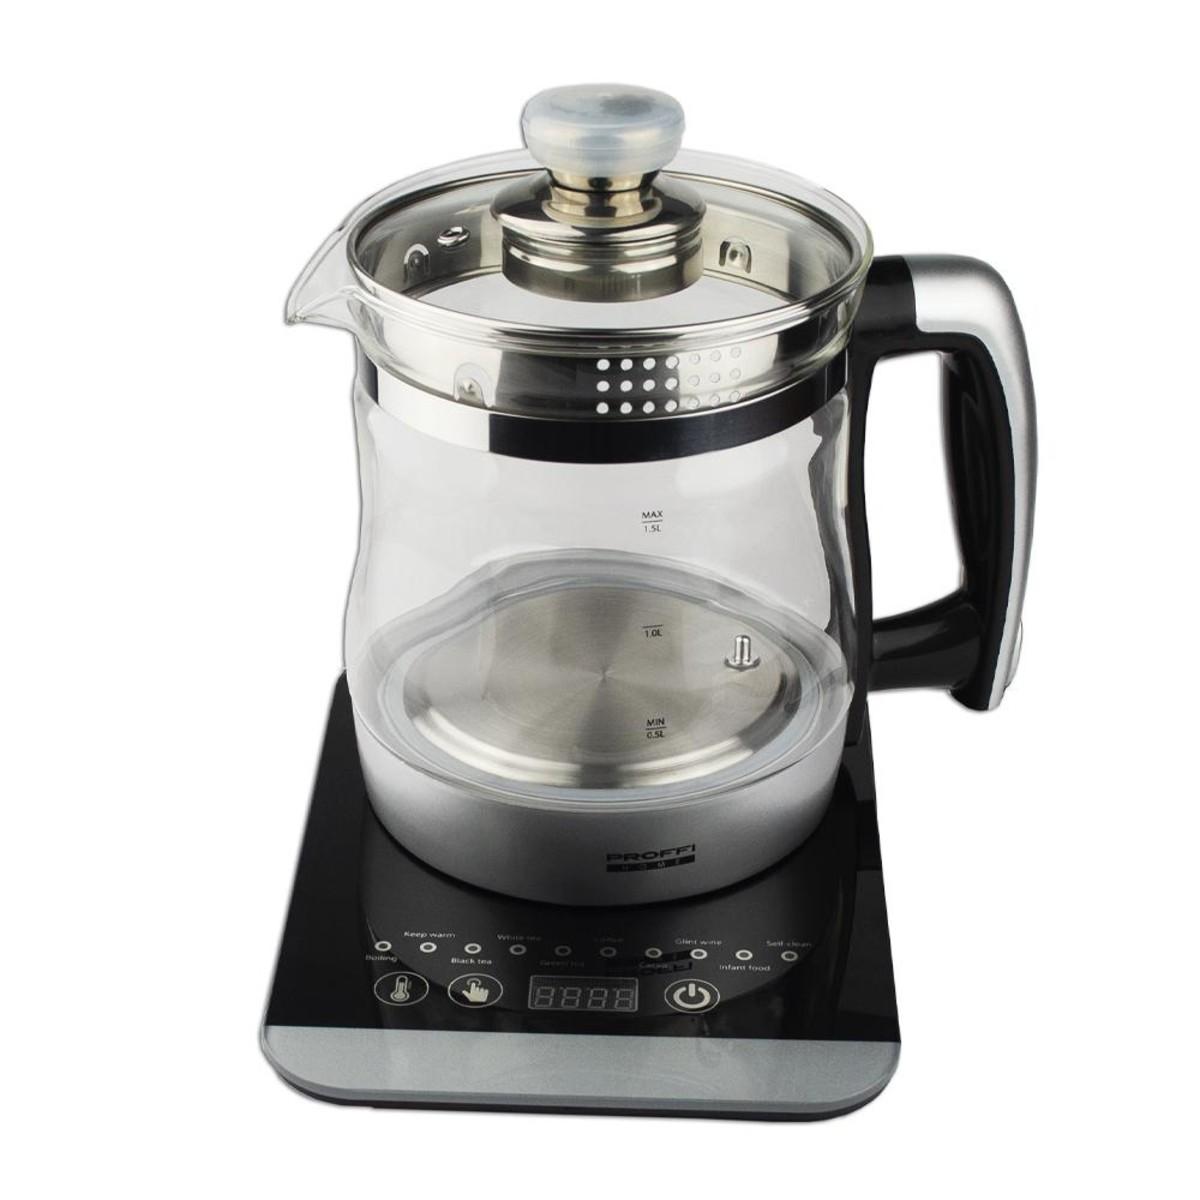 Электрический чайник PROFFI SMART PH8906 1.5 л